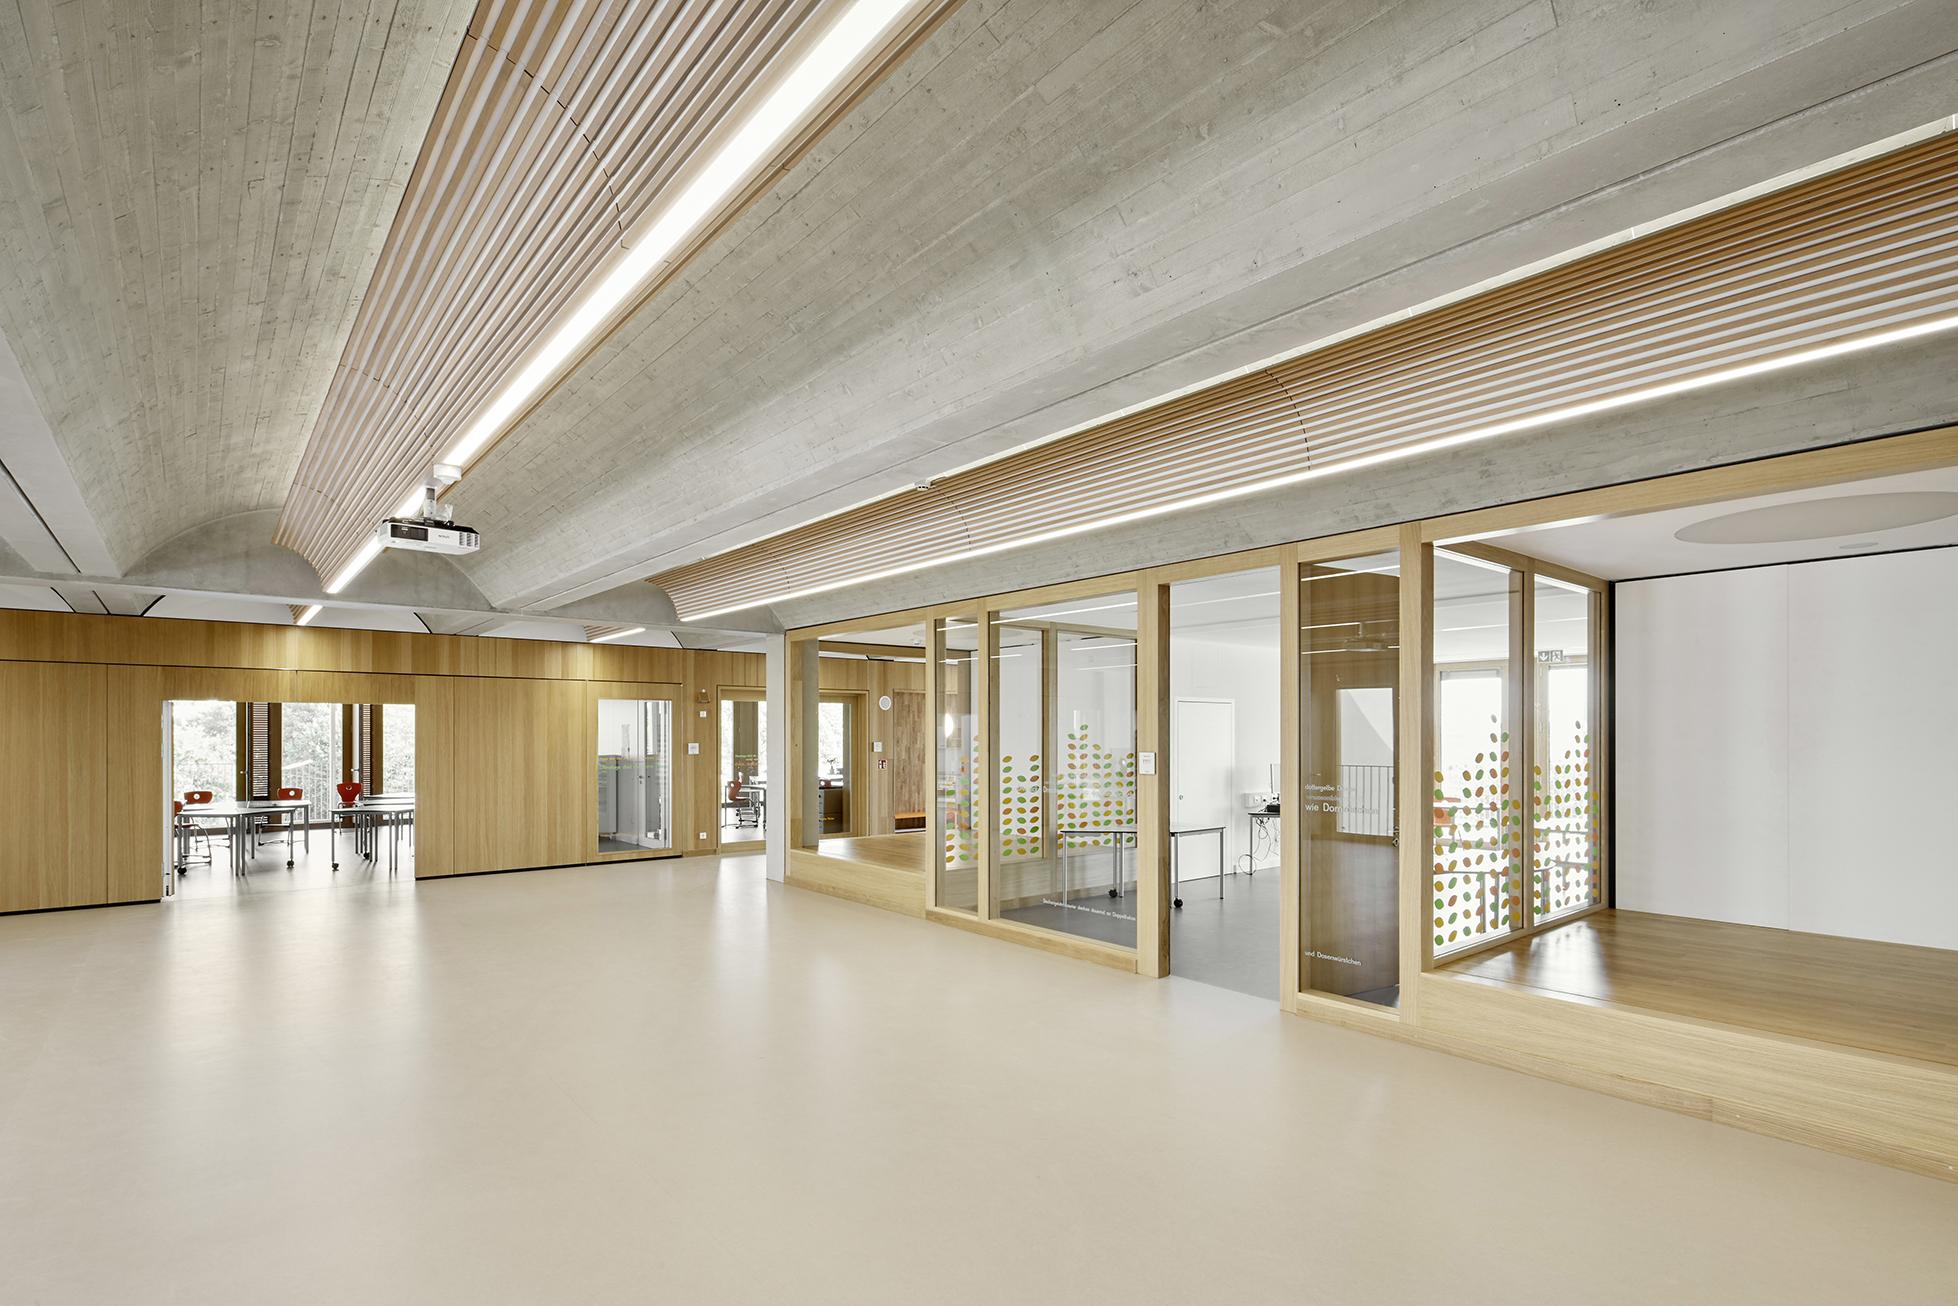 Die Materialien Beton und Holz prägen den gesamten Baukörper.